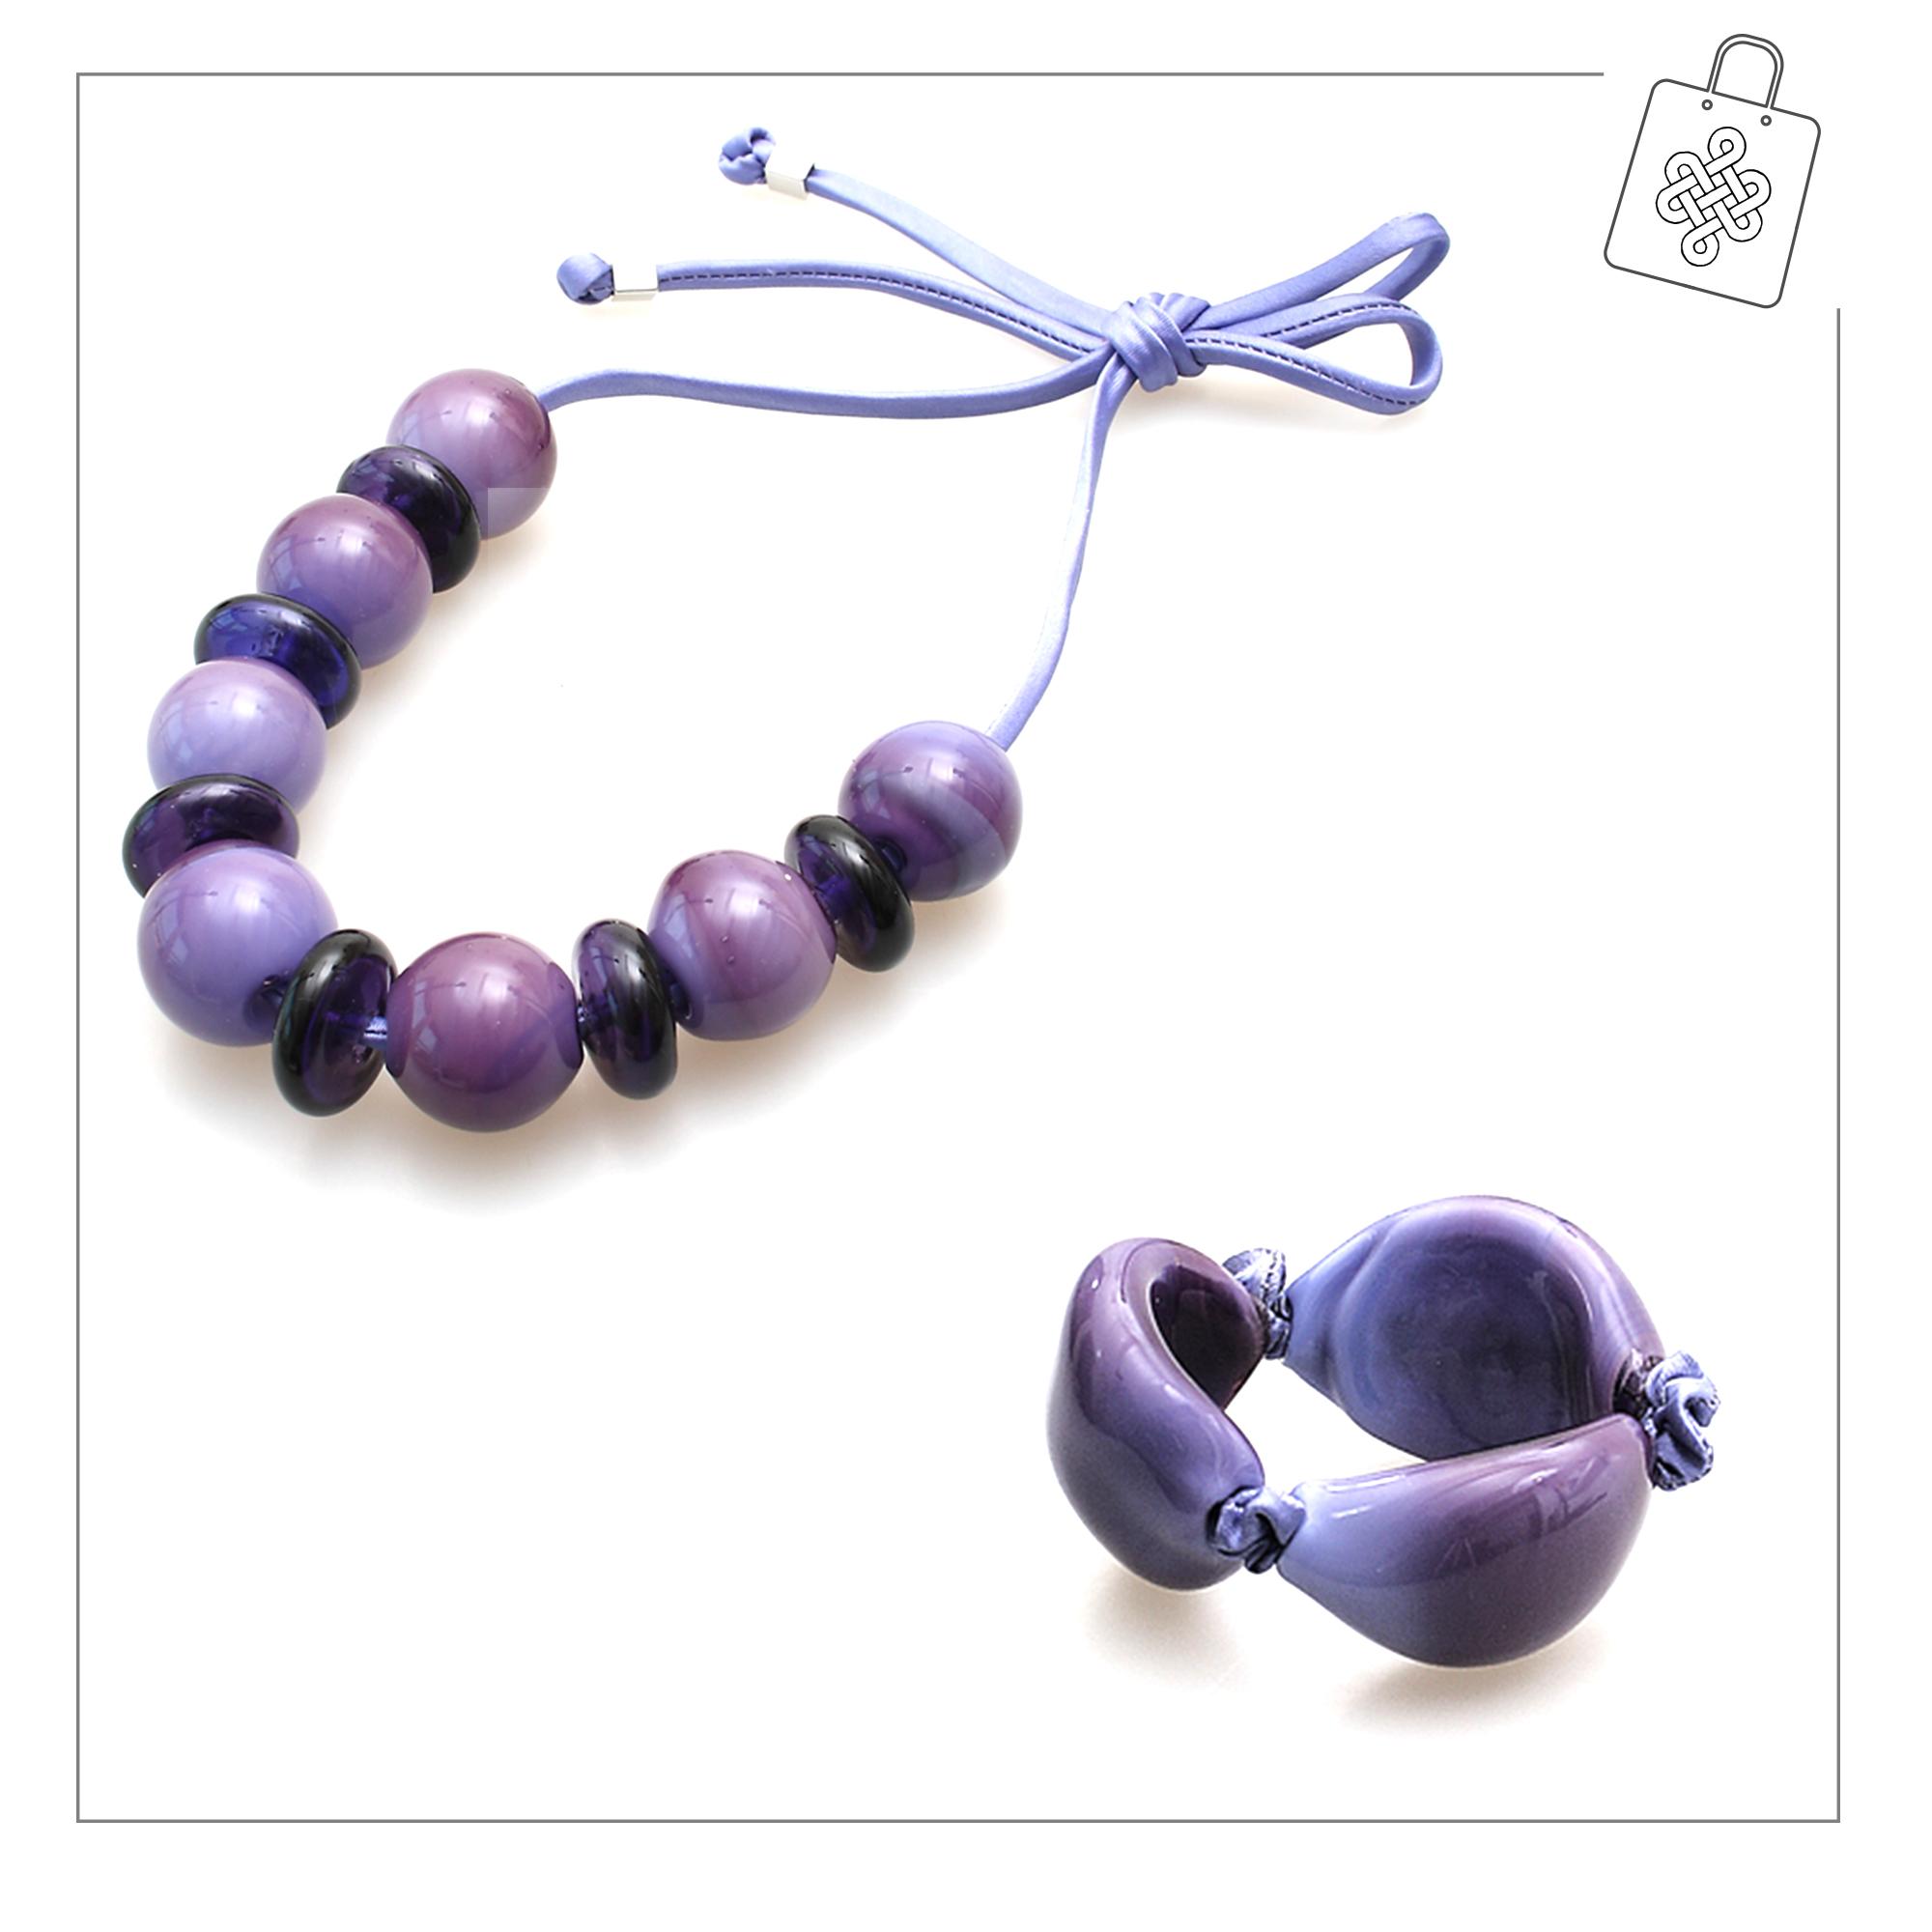 Antares Venezia Necklaces, Black, Murano Glass, 2017, One Size